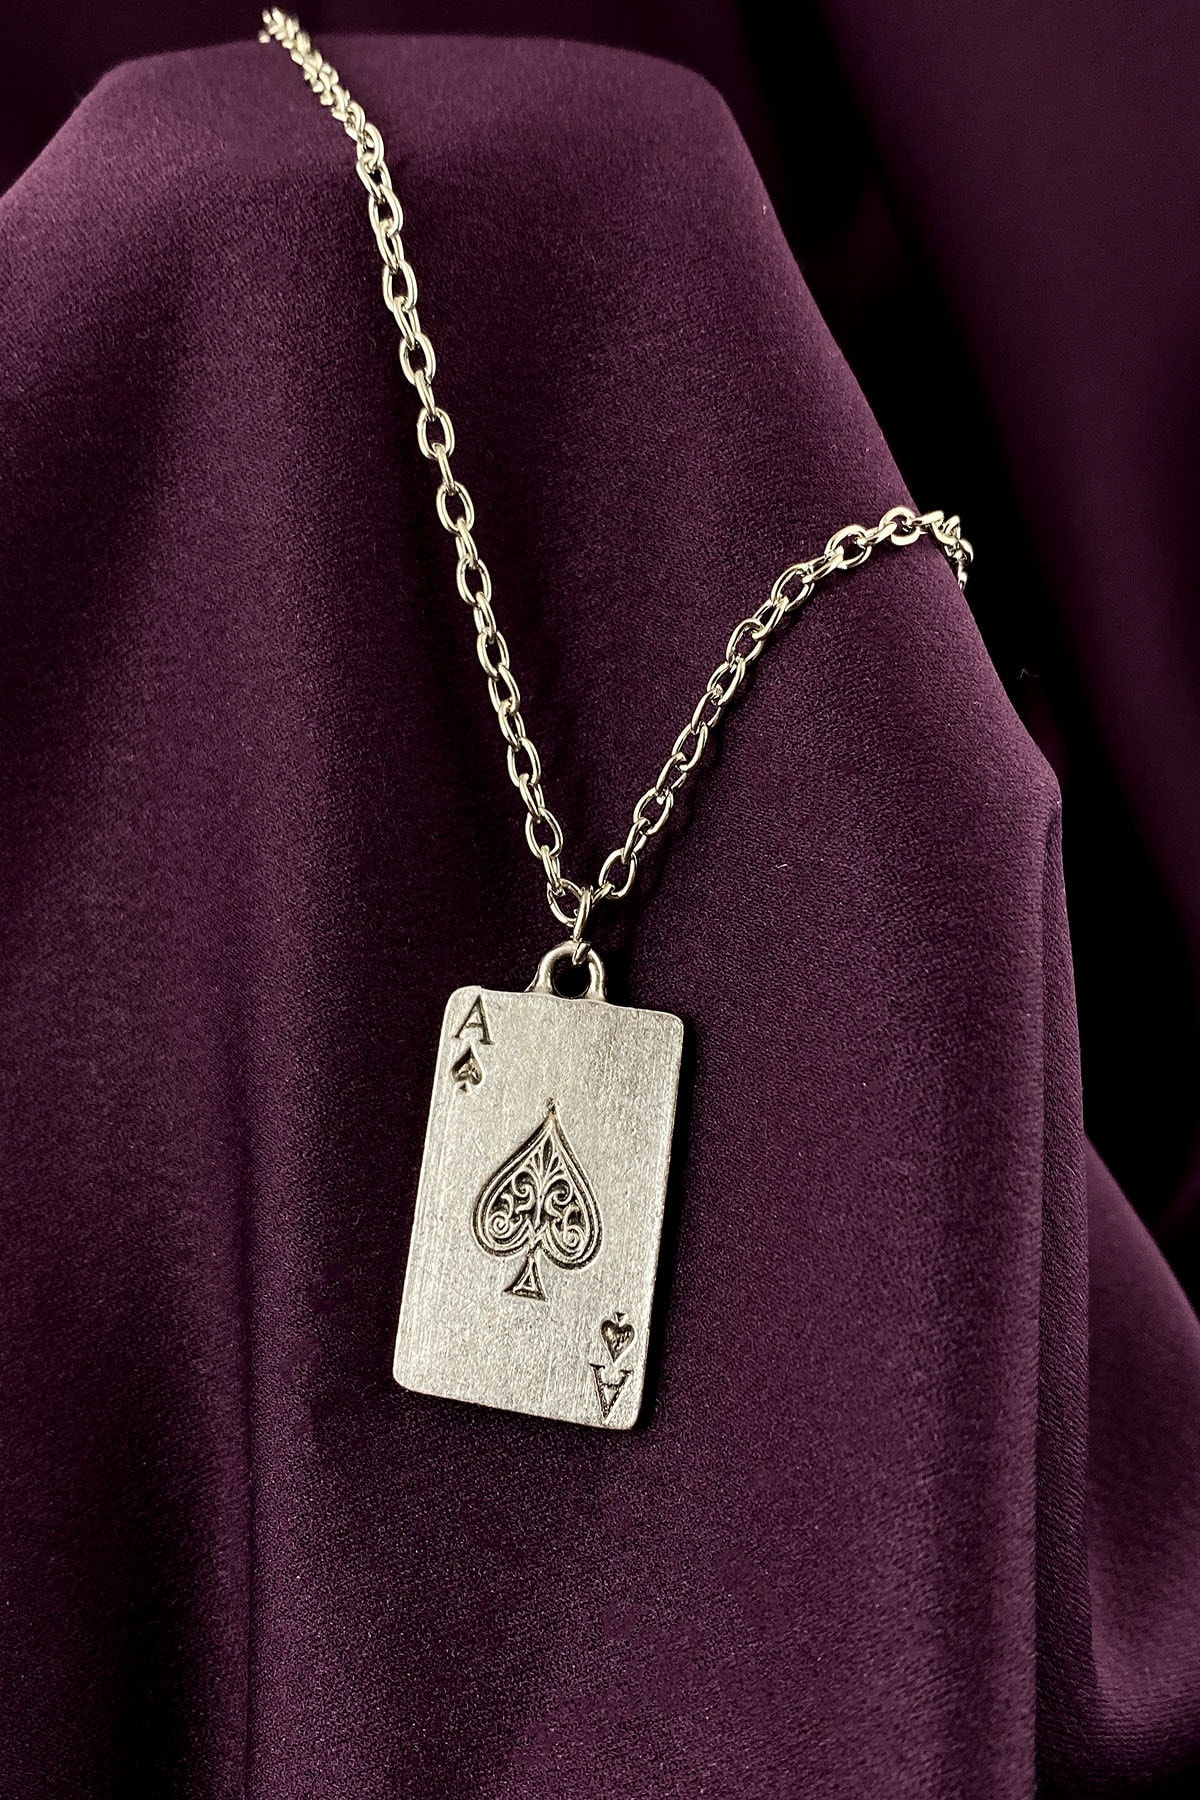 Maça As Poker İskambil Mat Gümüş Kaplama Zincir Kolye